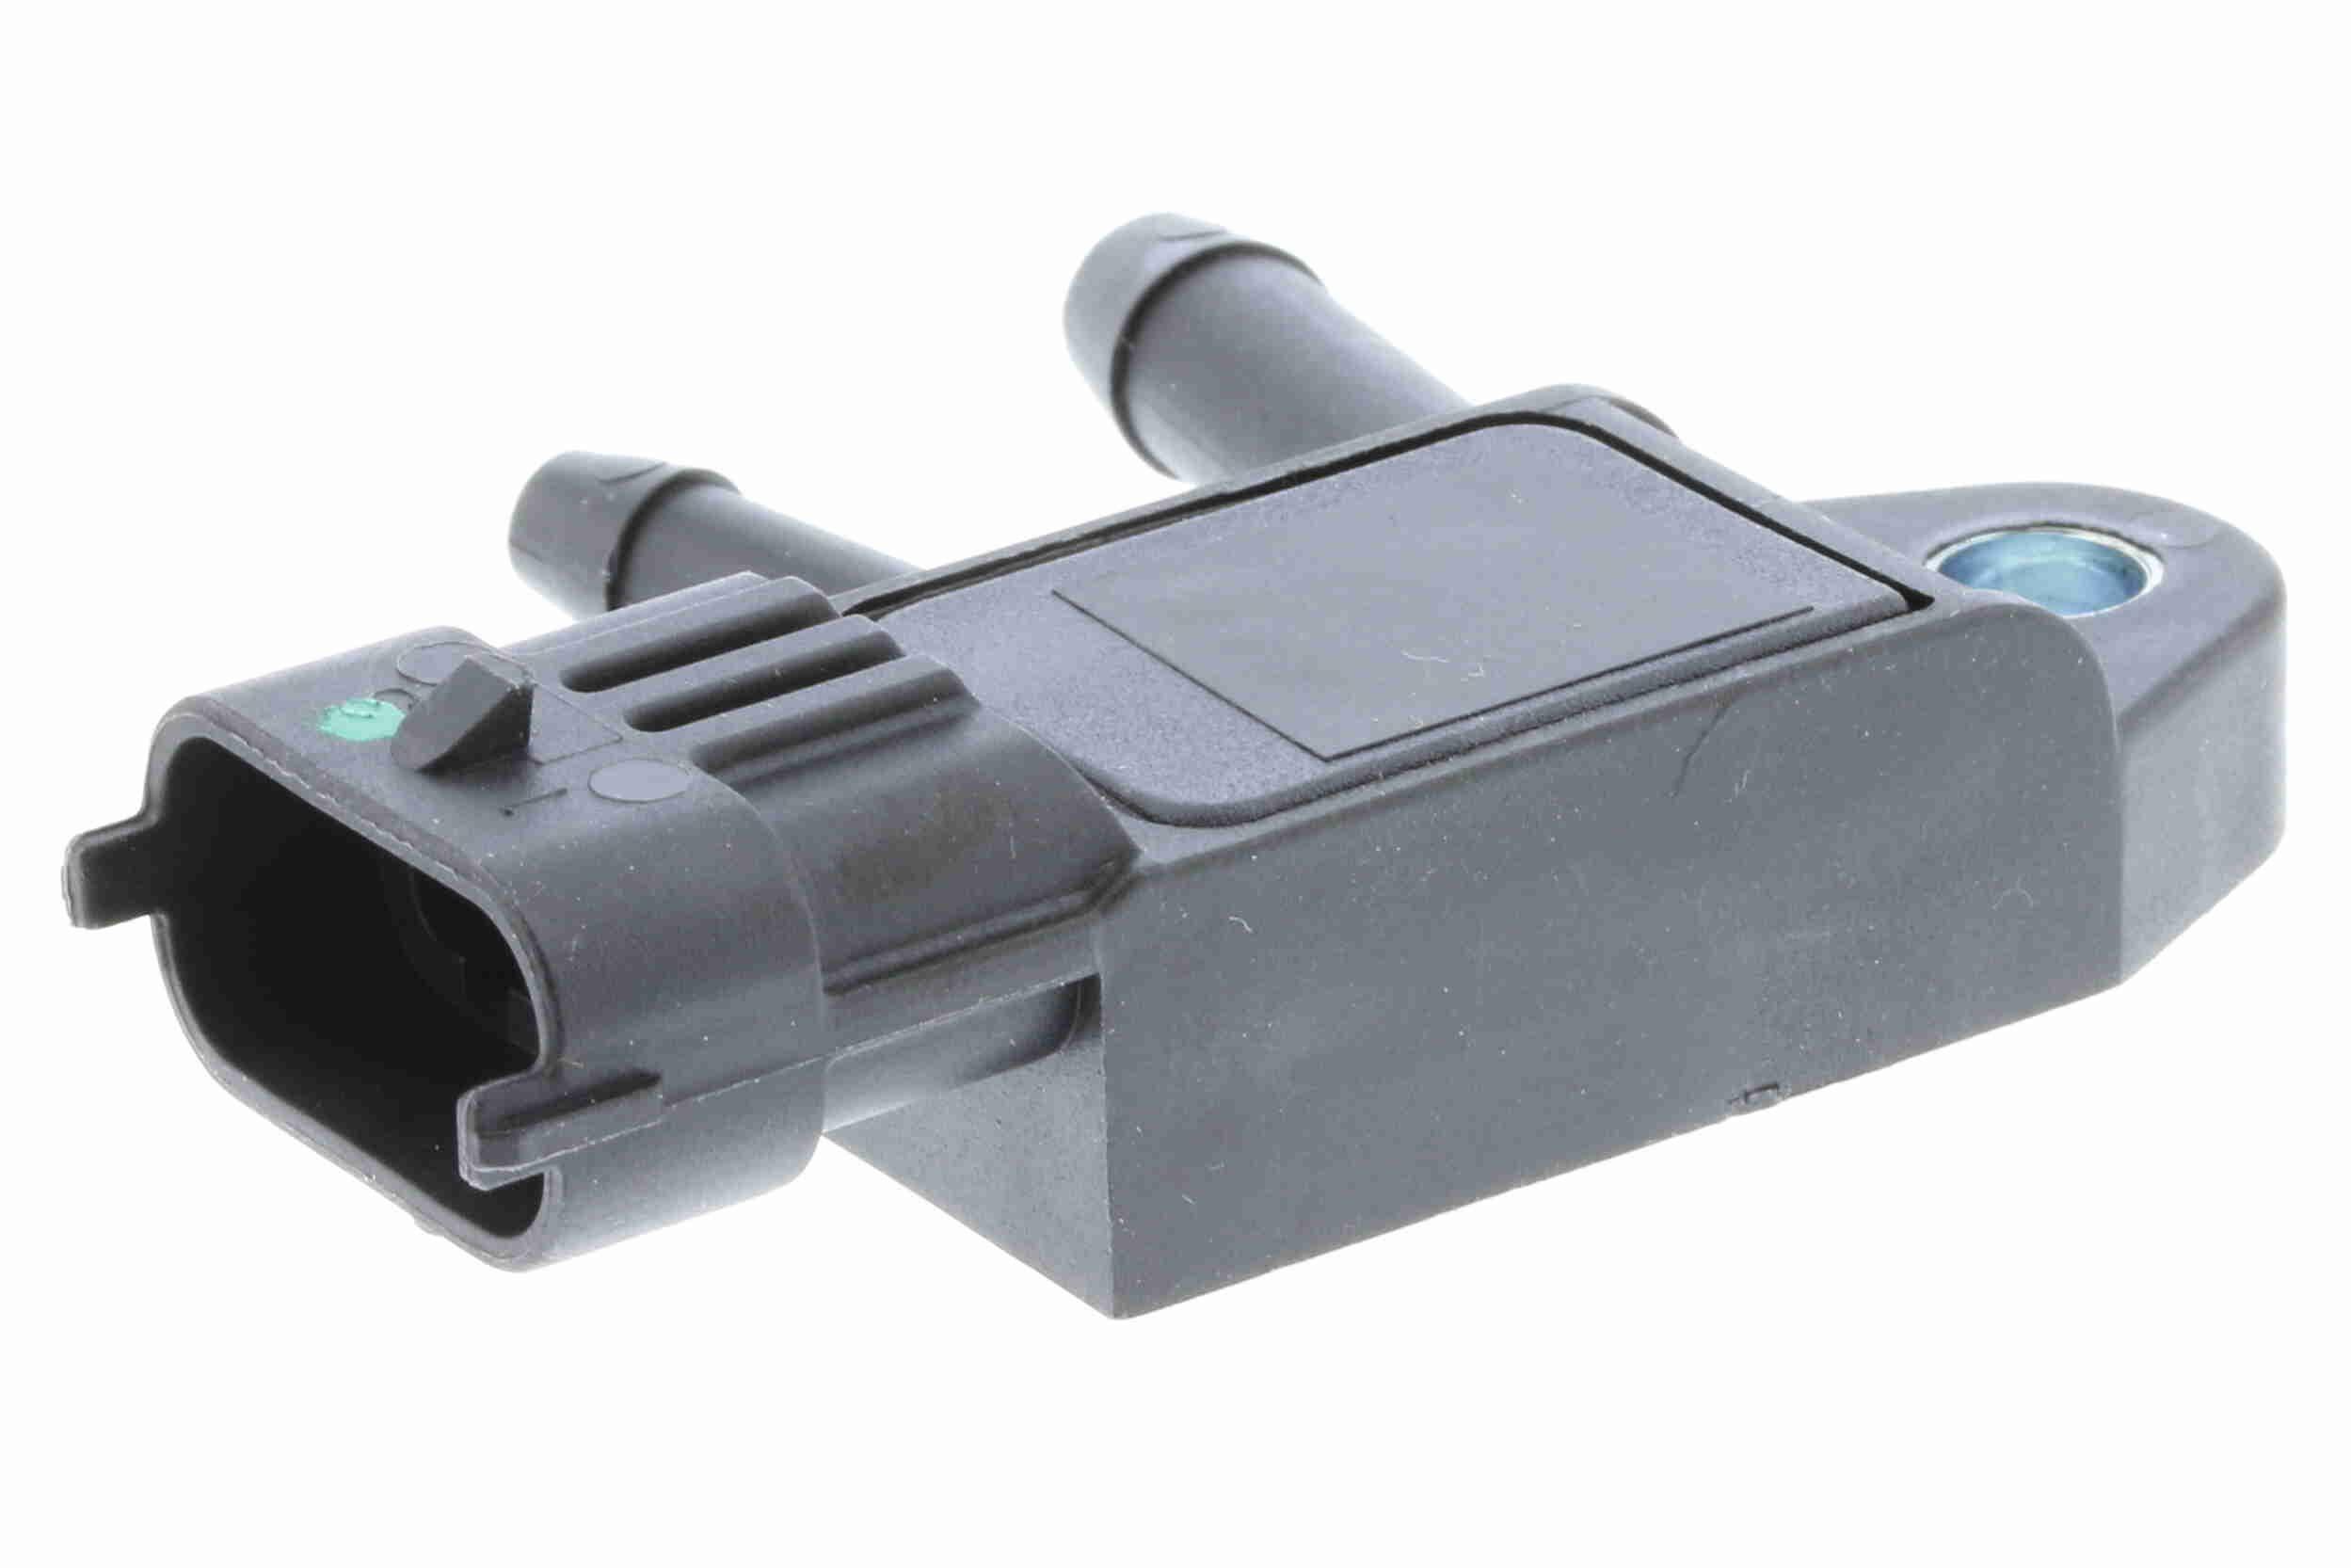 RENAULT 12 Differenzdrucksensor - Original VEMO V38-72-0126 Pol-Anzahl: 3-polig